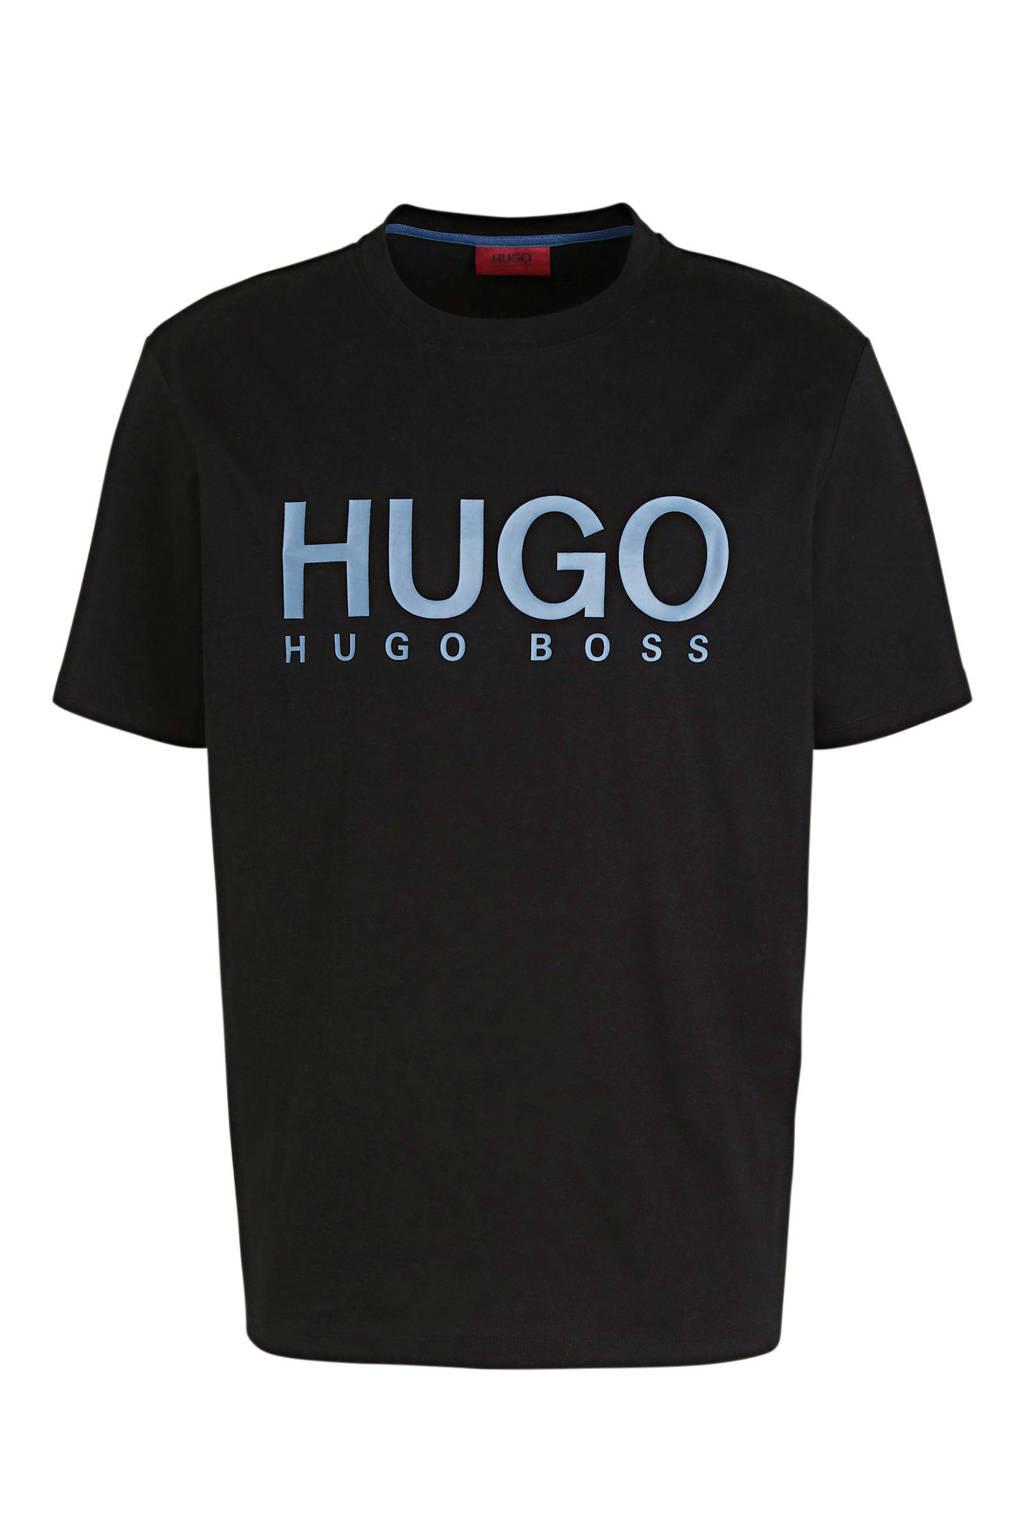 HUGO T-shirt met logo zwart, Zwart